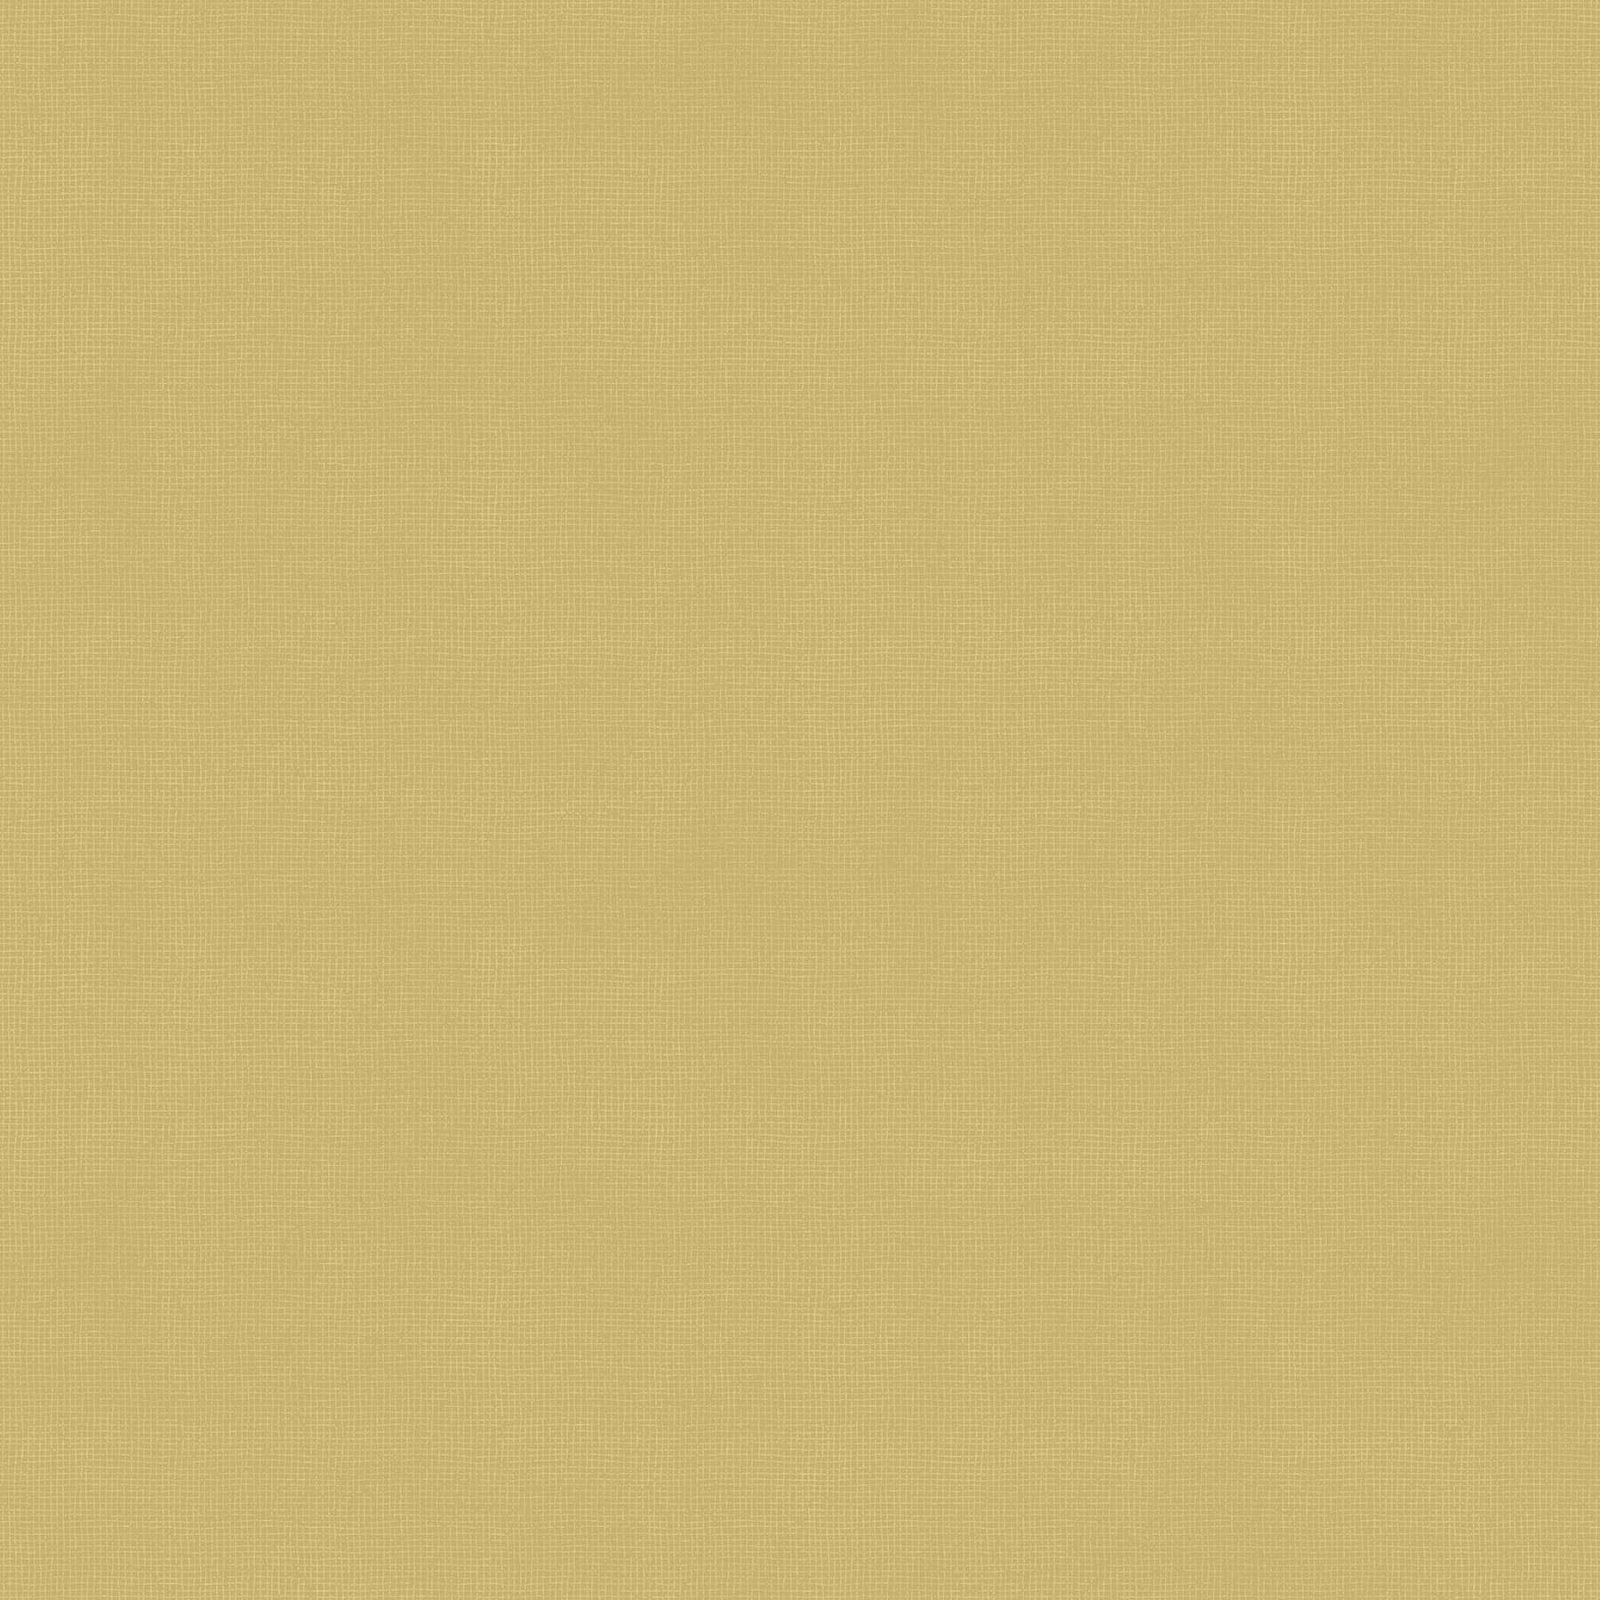 Urban Grunge 22682 (color 54)